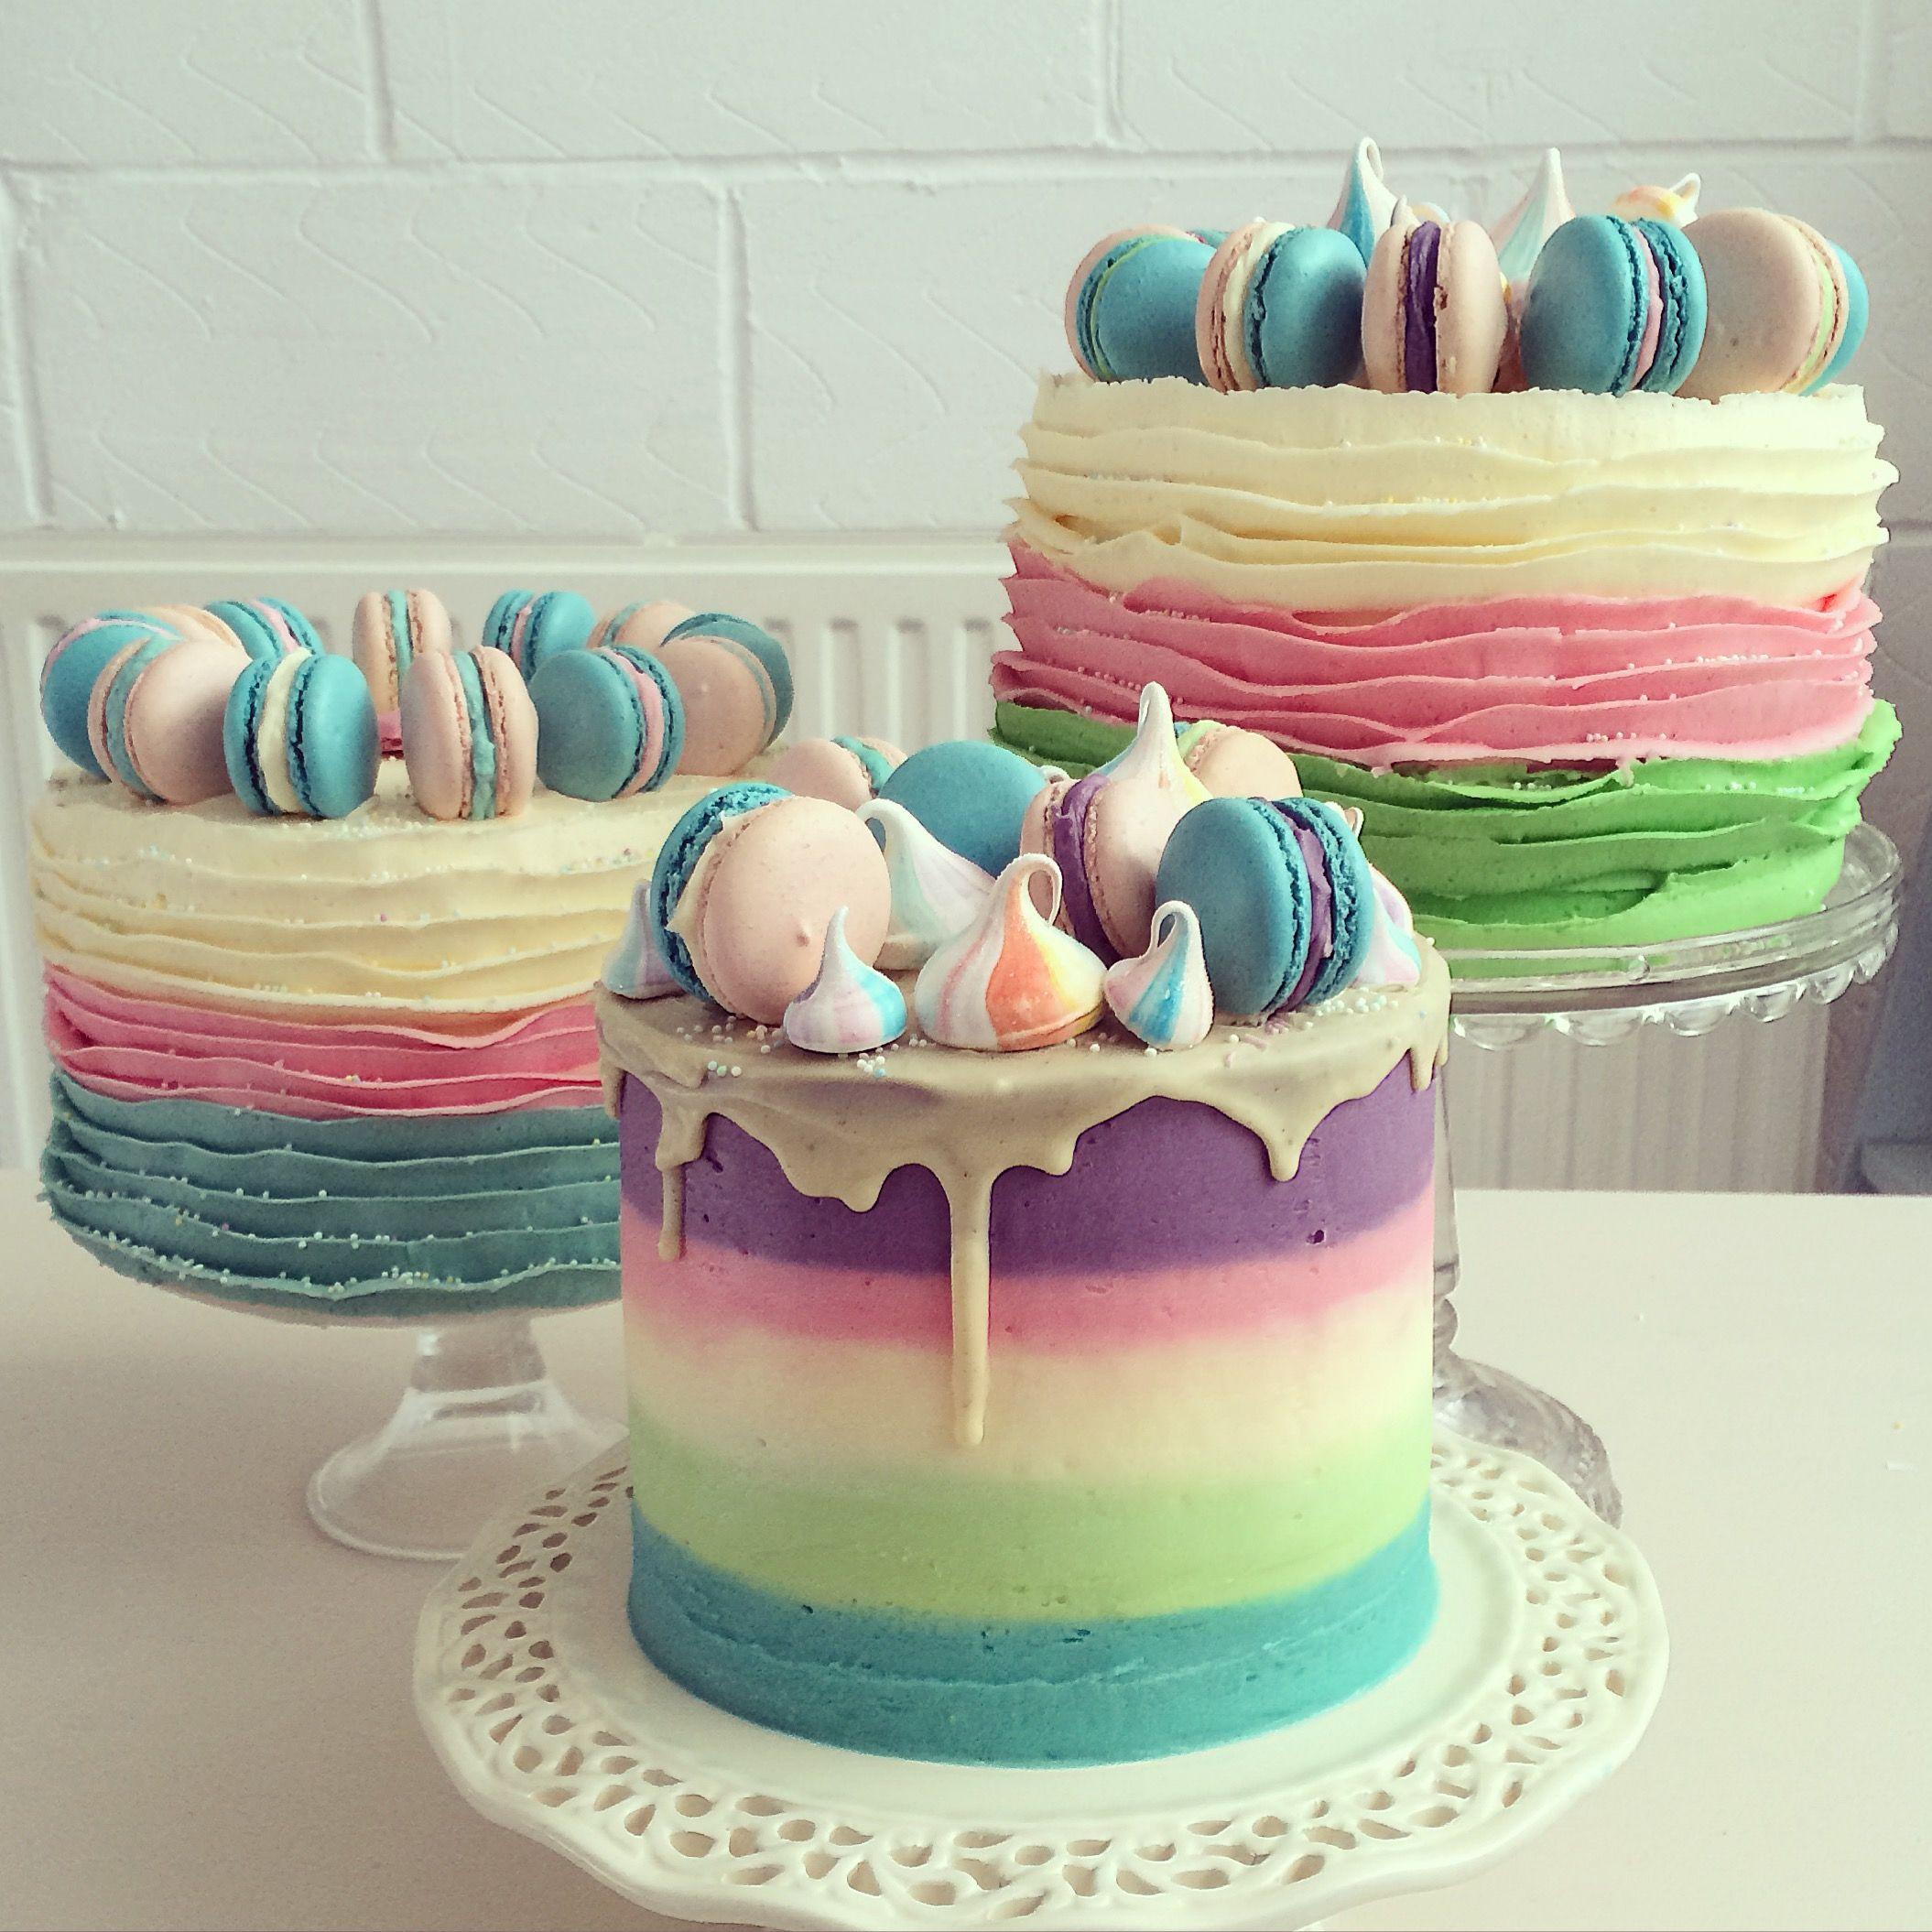 Striped Buttercream Cakes